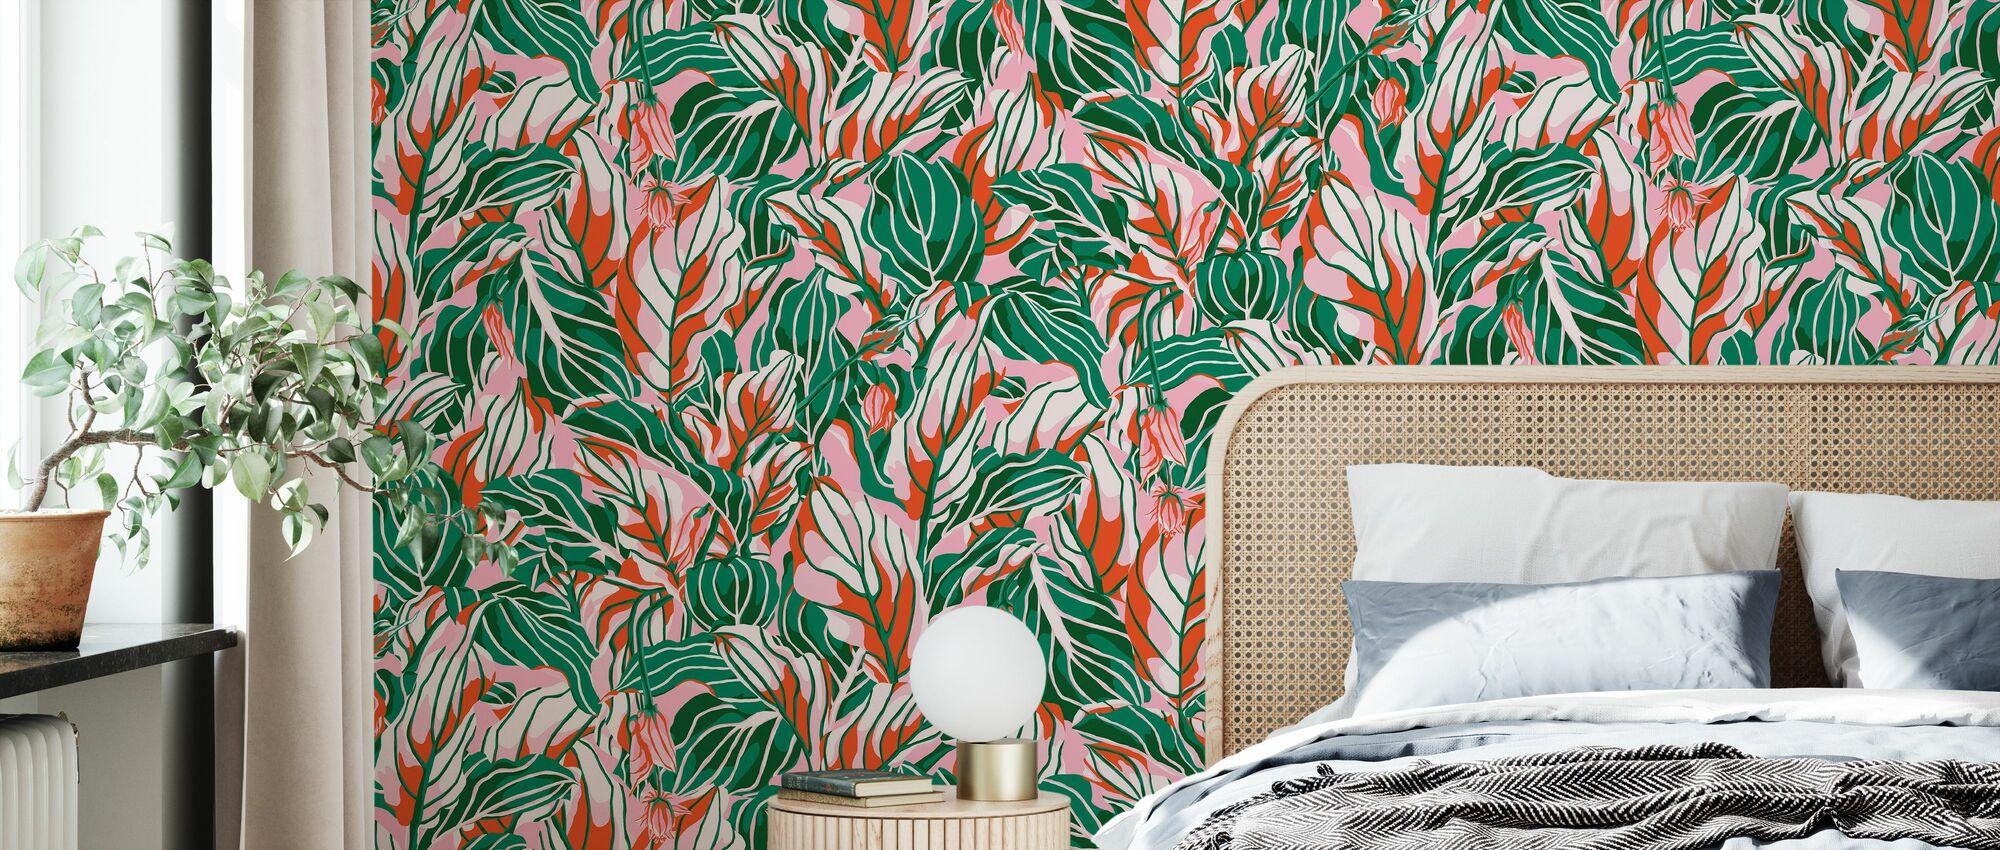 Stunner Peachy - Wallpaper - Bedroom